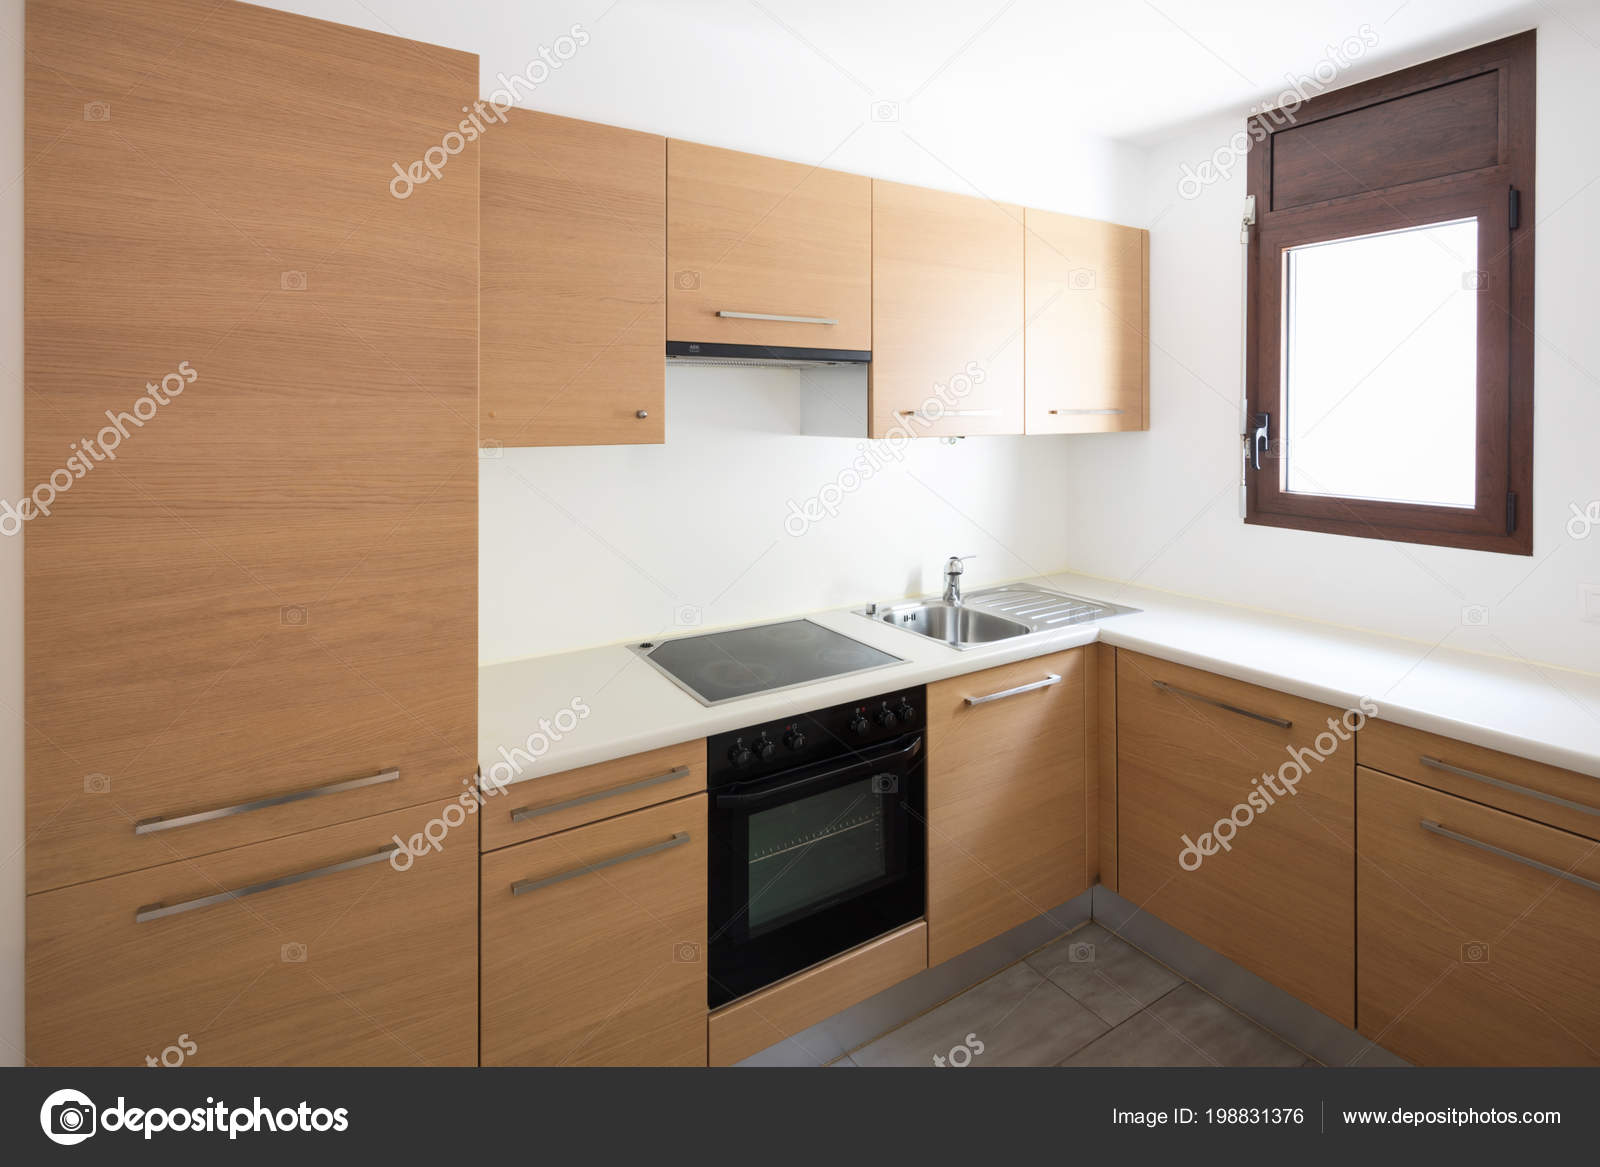 Keuken Moderne Klein : Moderne keuken hout witte muren klein venster niemand binnen